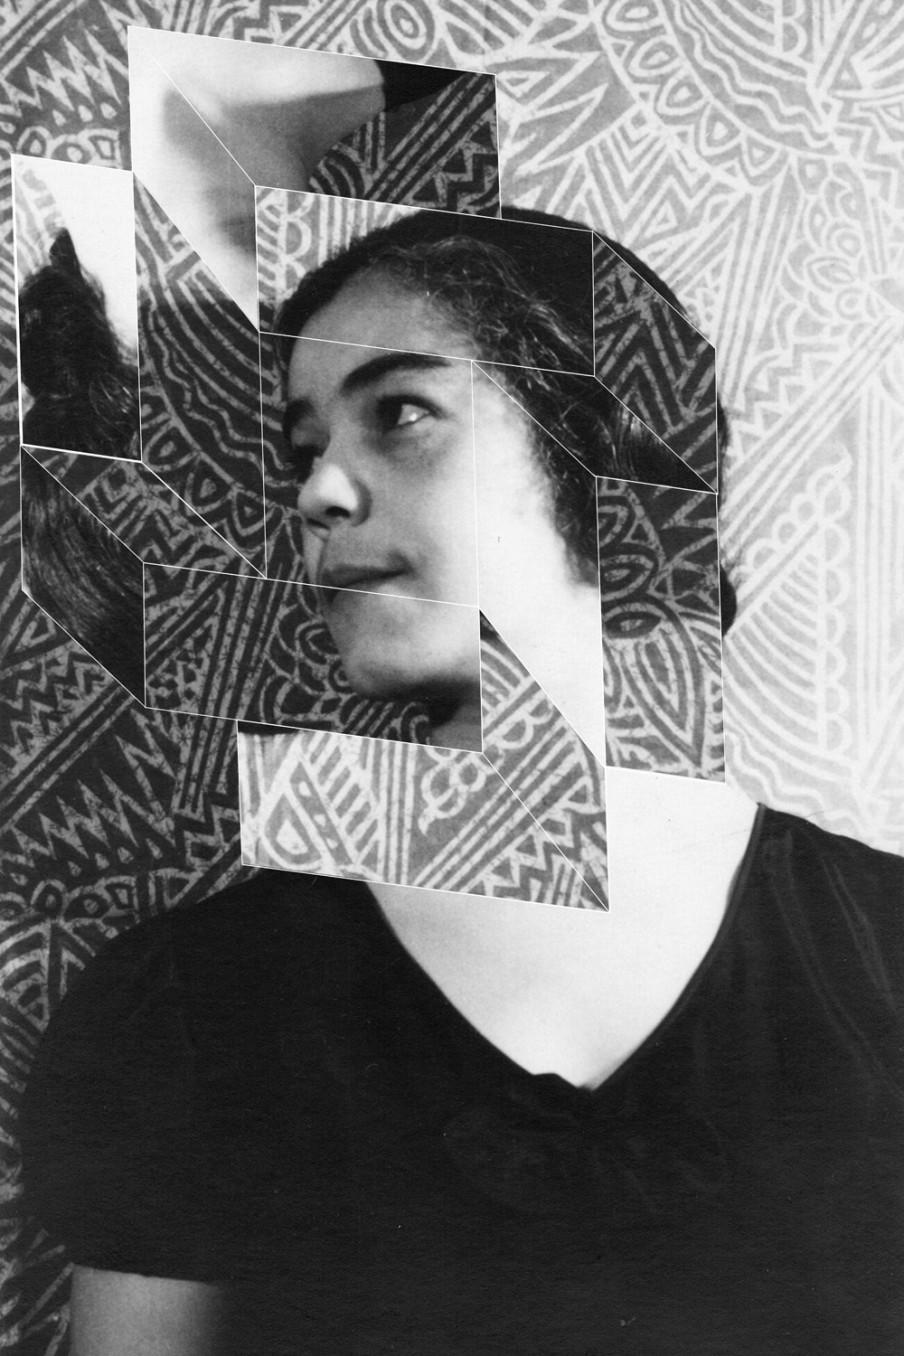 Andrea Geyer, Constellations (Dorothy Peterson after VanVechten), 2017, Hand-cut archival print on rag paper, 86.4 x 58.4 cm, 34 x 23 in (unframed)